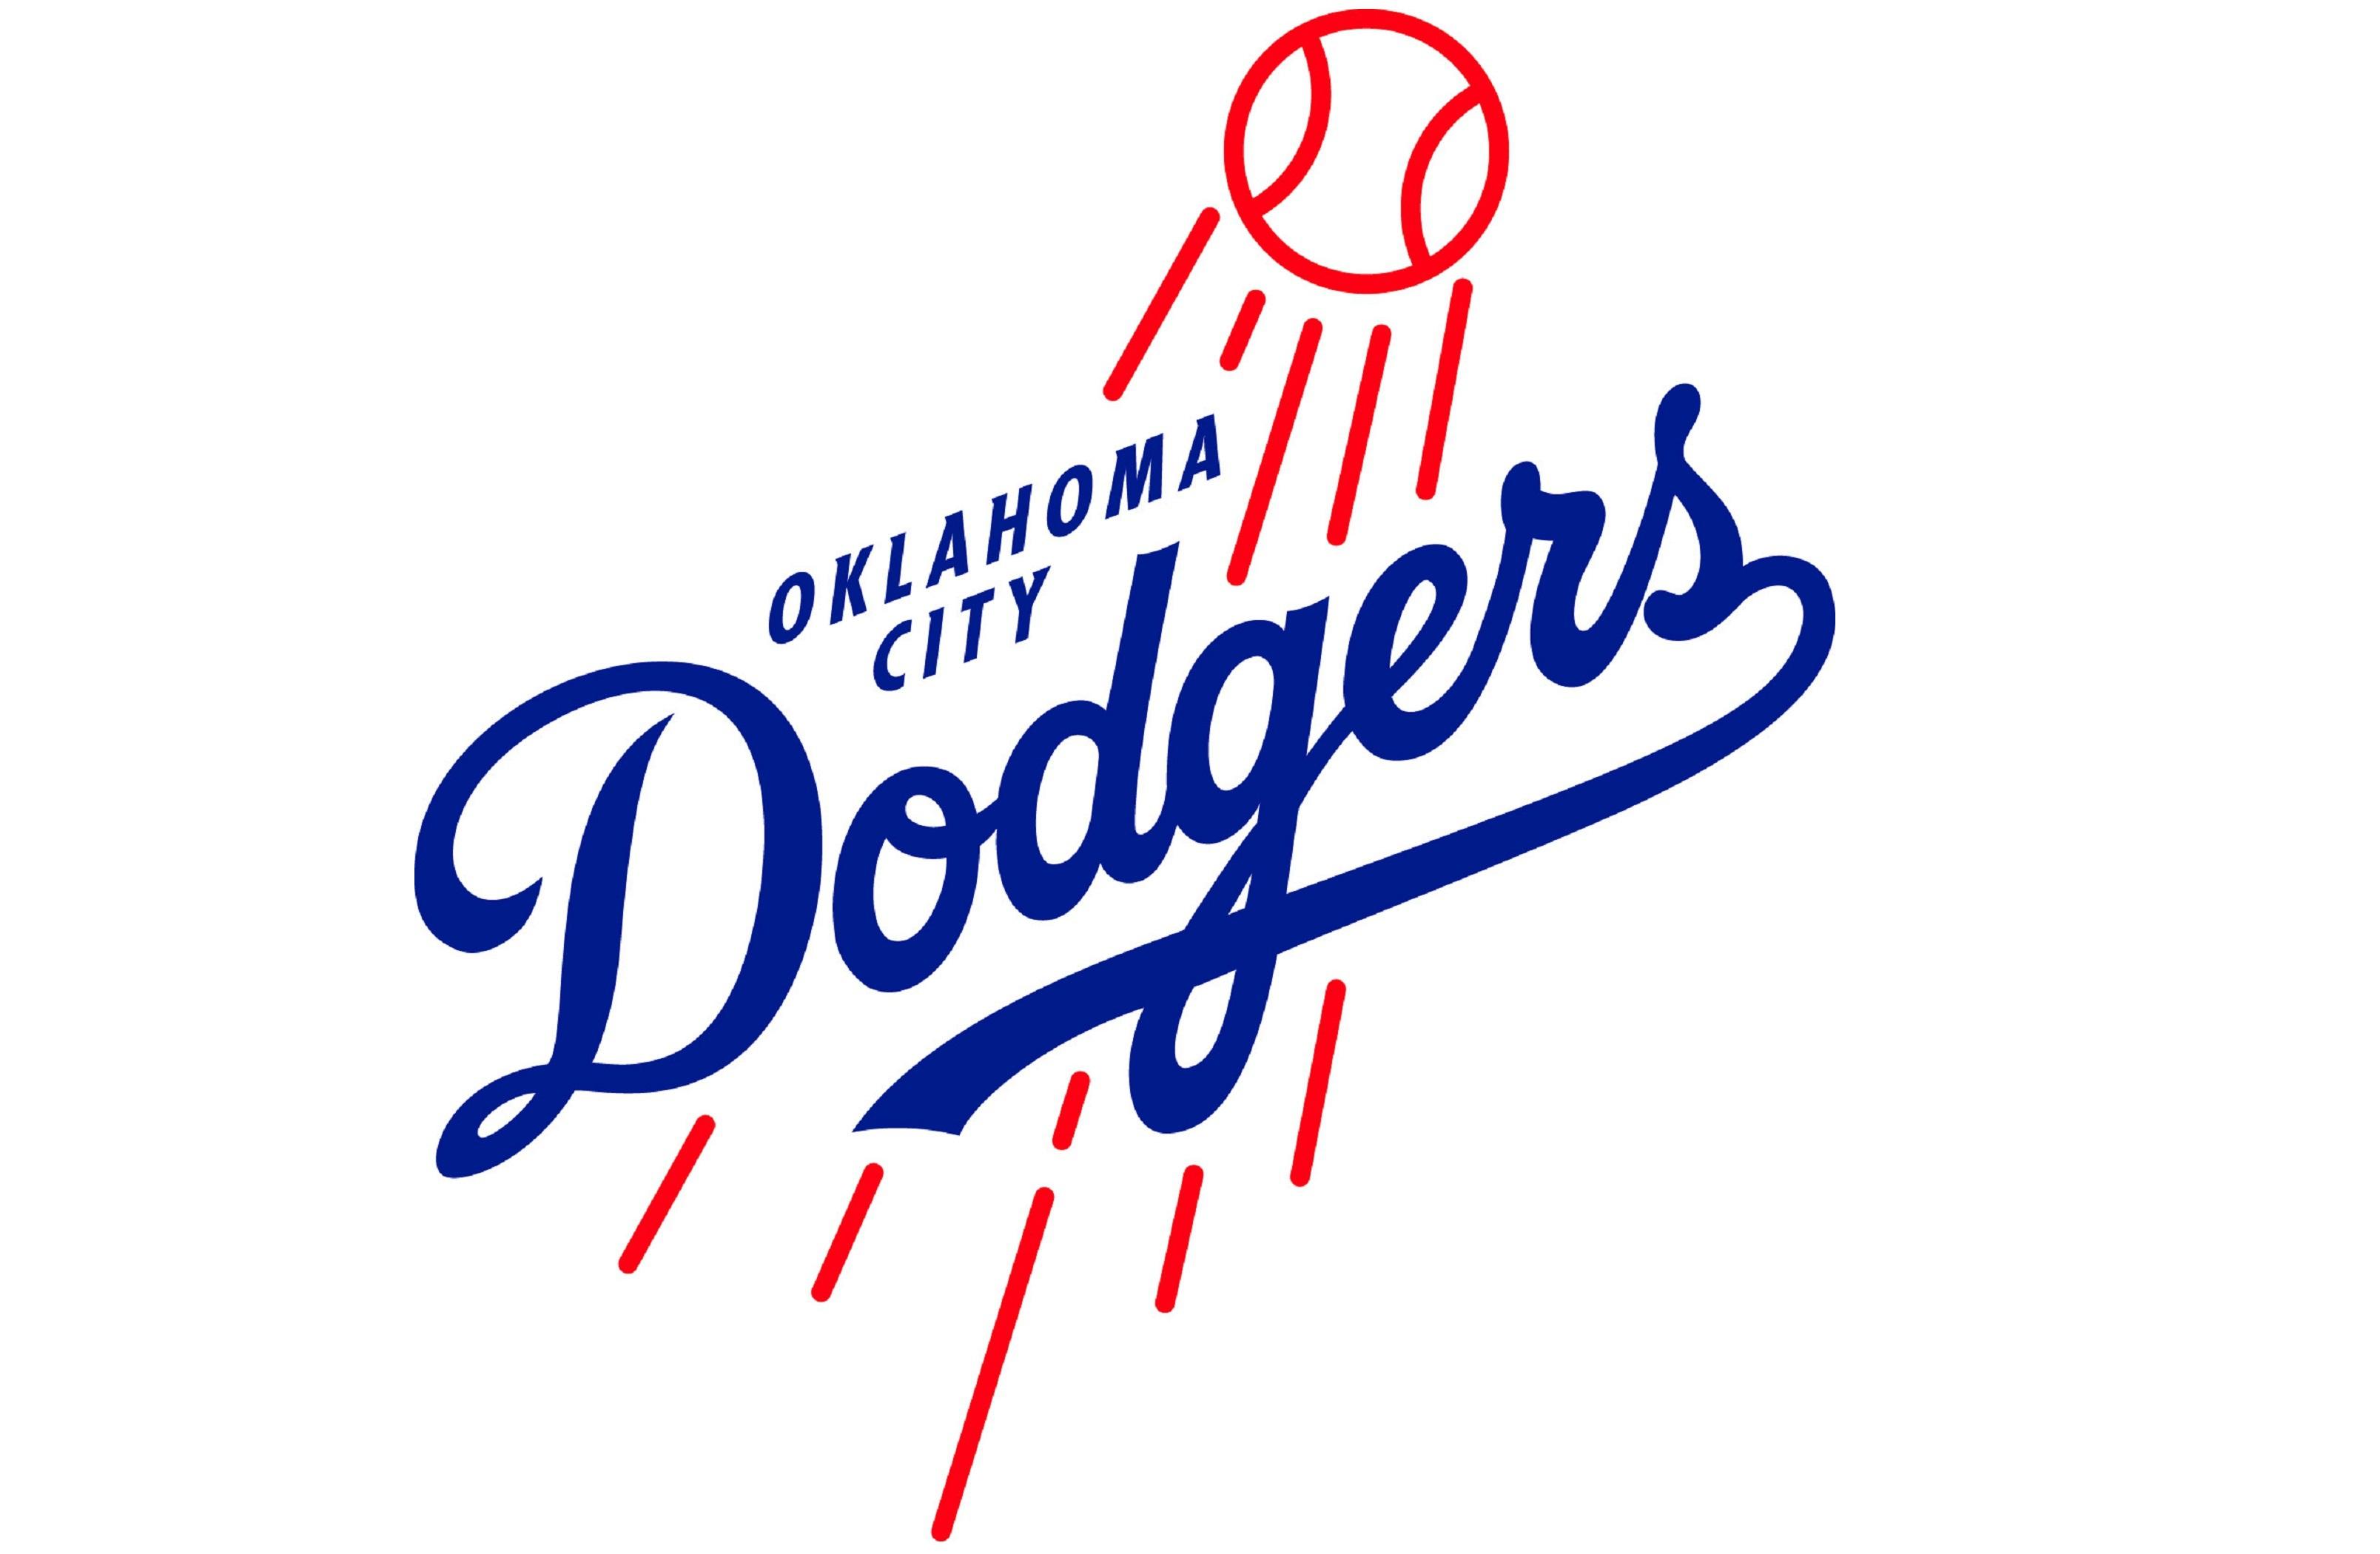 Oklahoma City Dodgers Hd Wallpaper